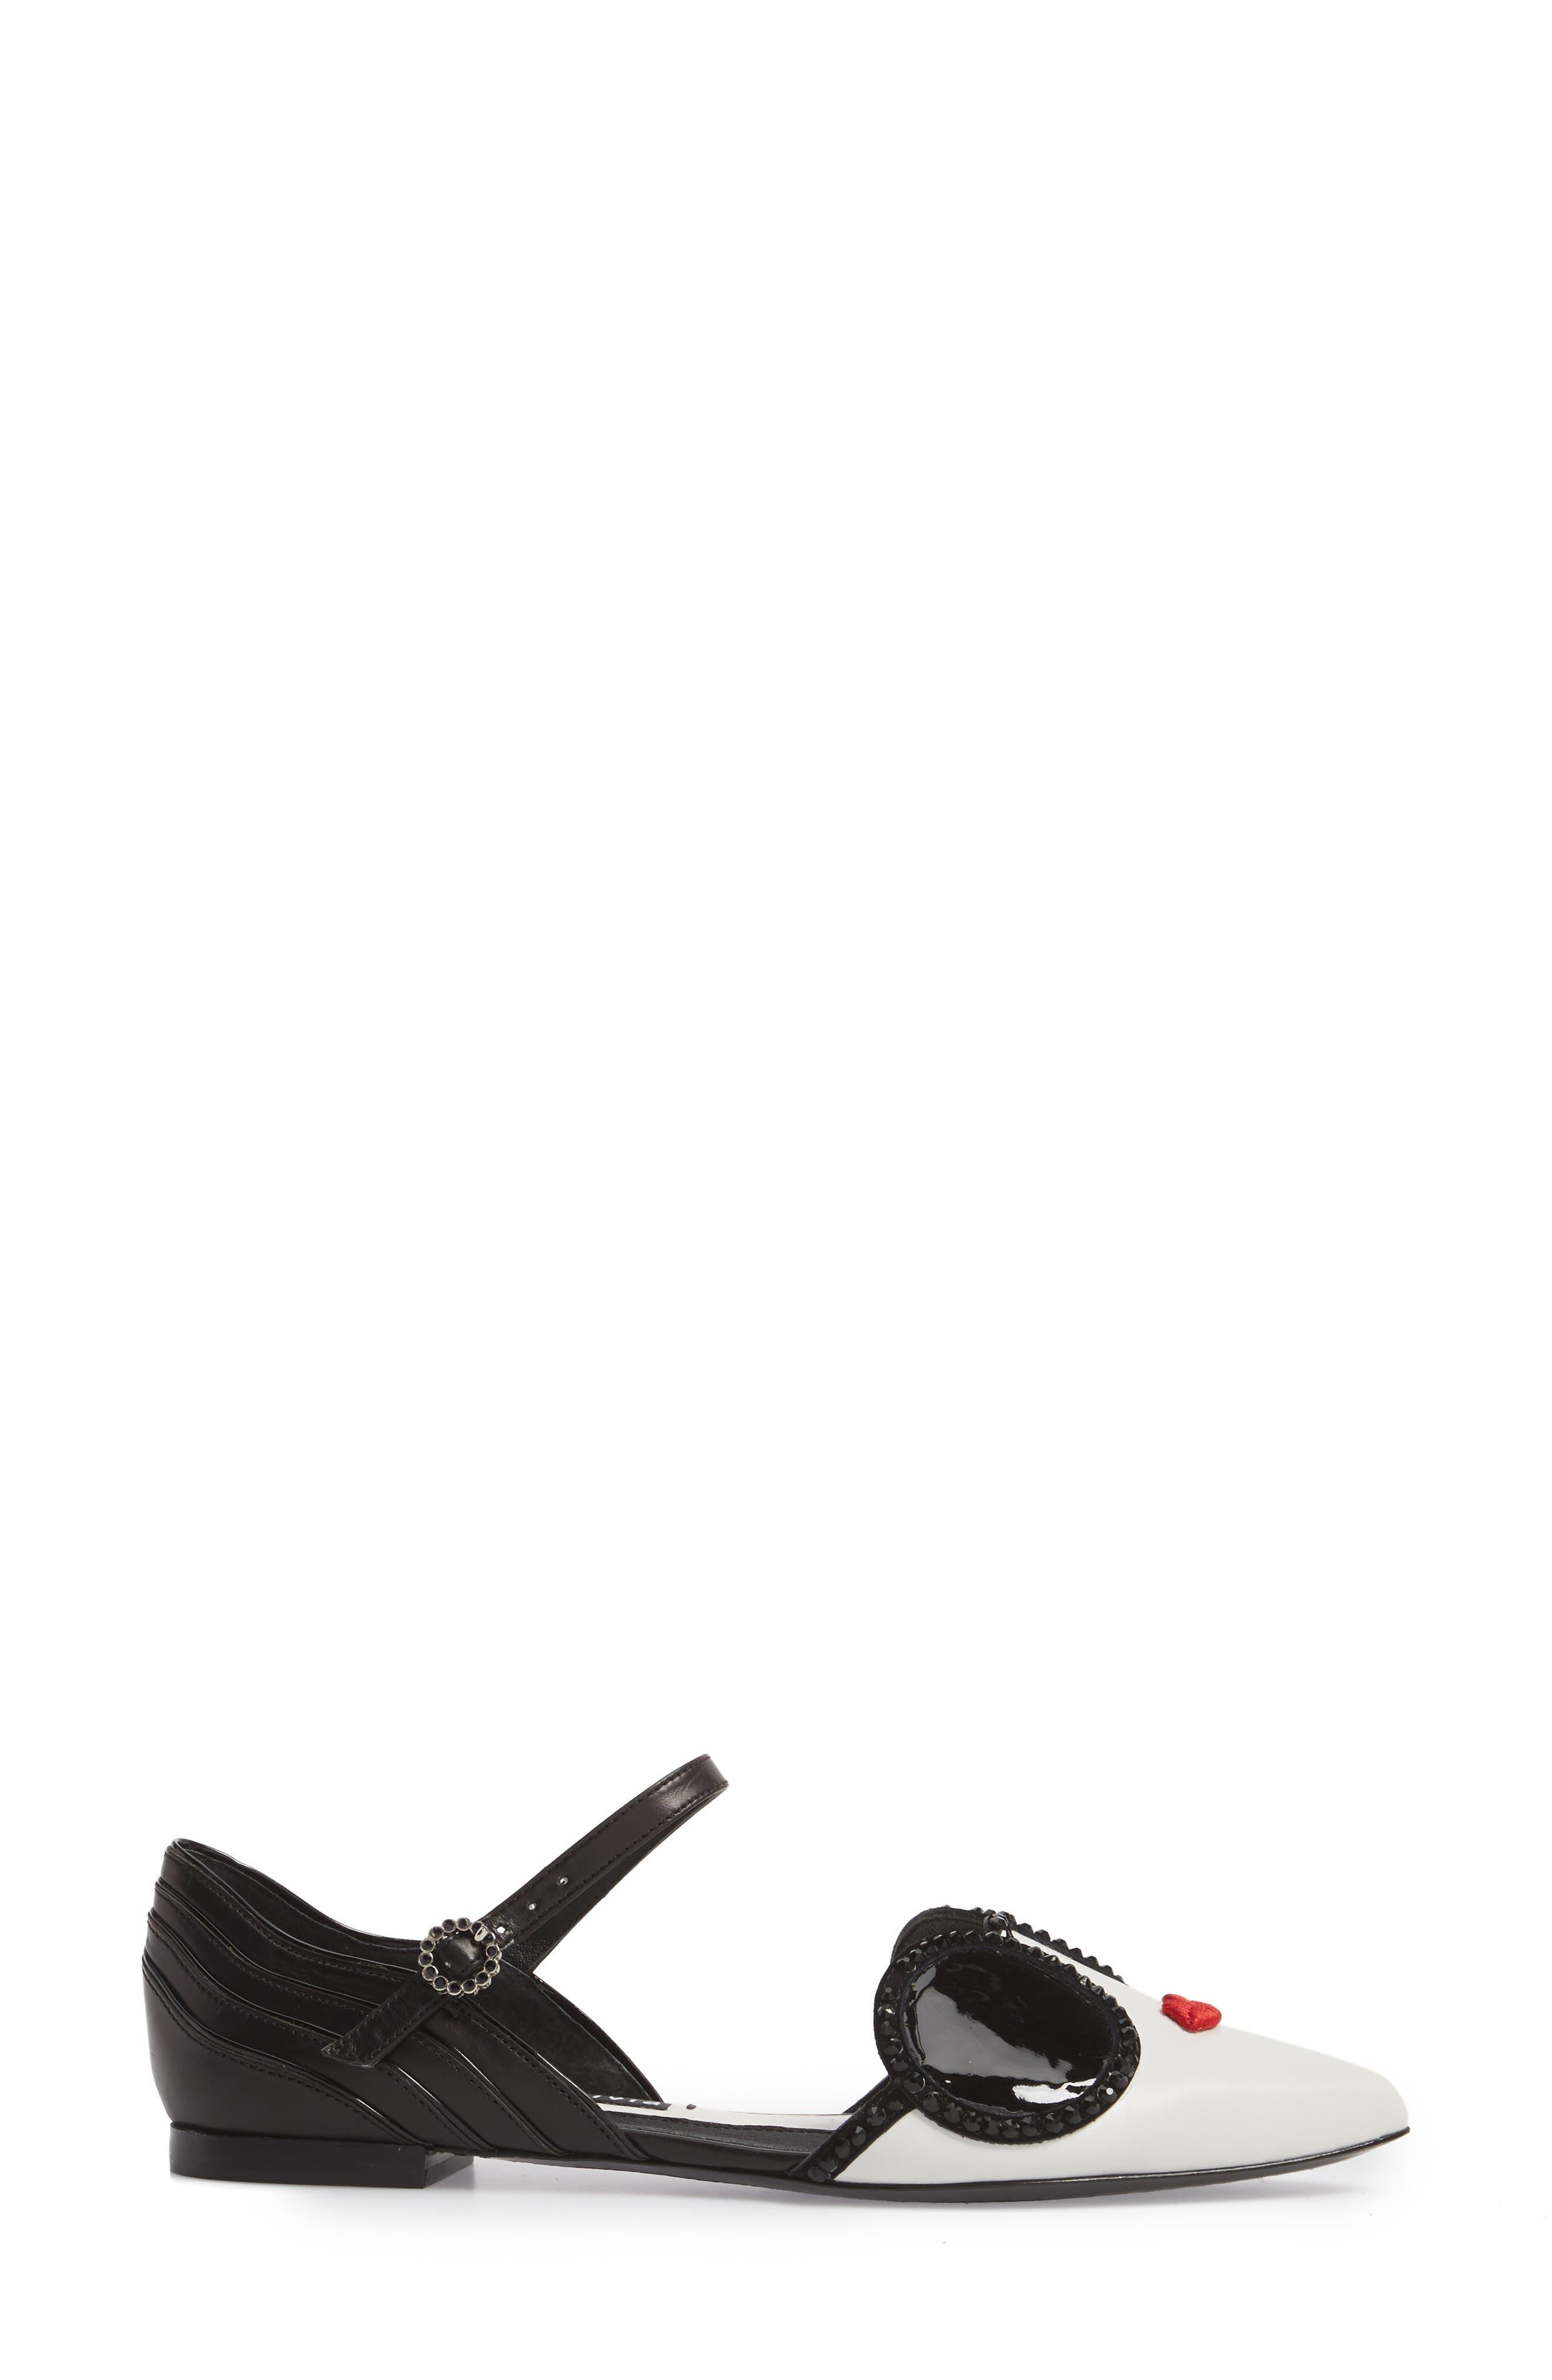 Lexi Embellished Pointy Toe Flat,                             Alternate thumbnail 3, color,                             Bianco/ Black/ Poppy